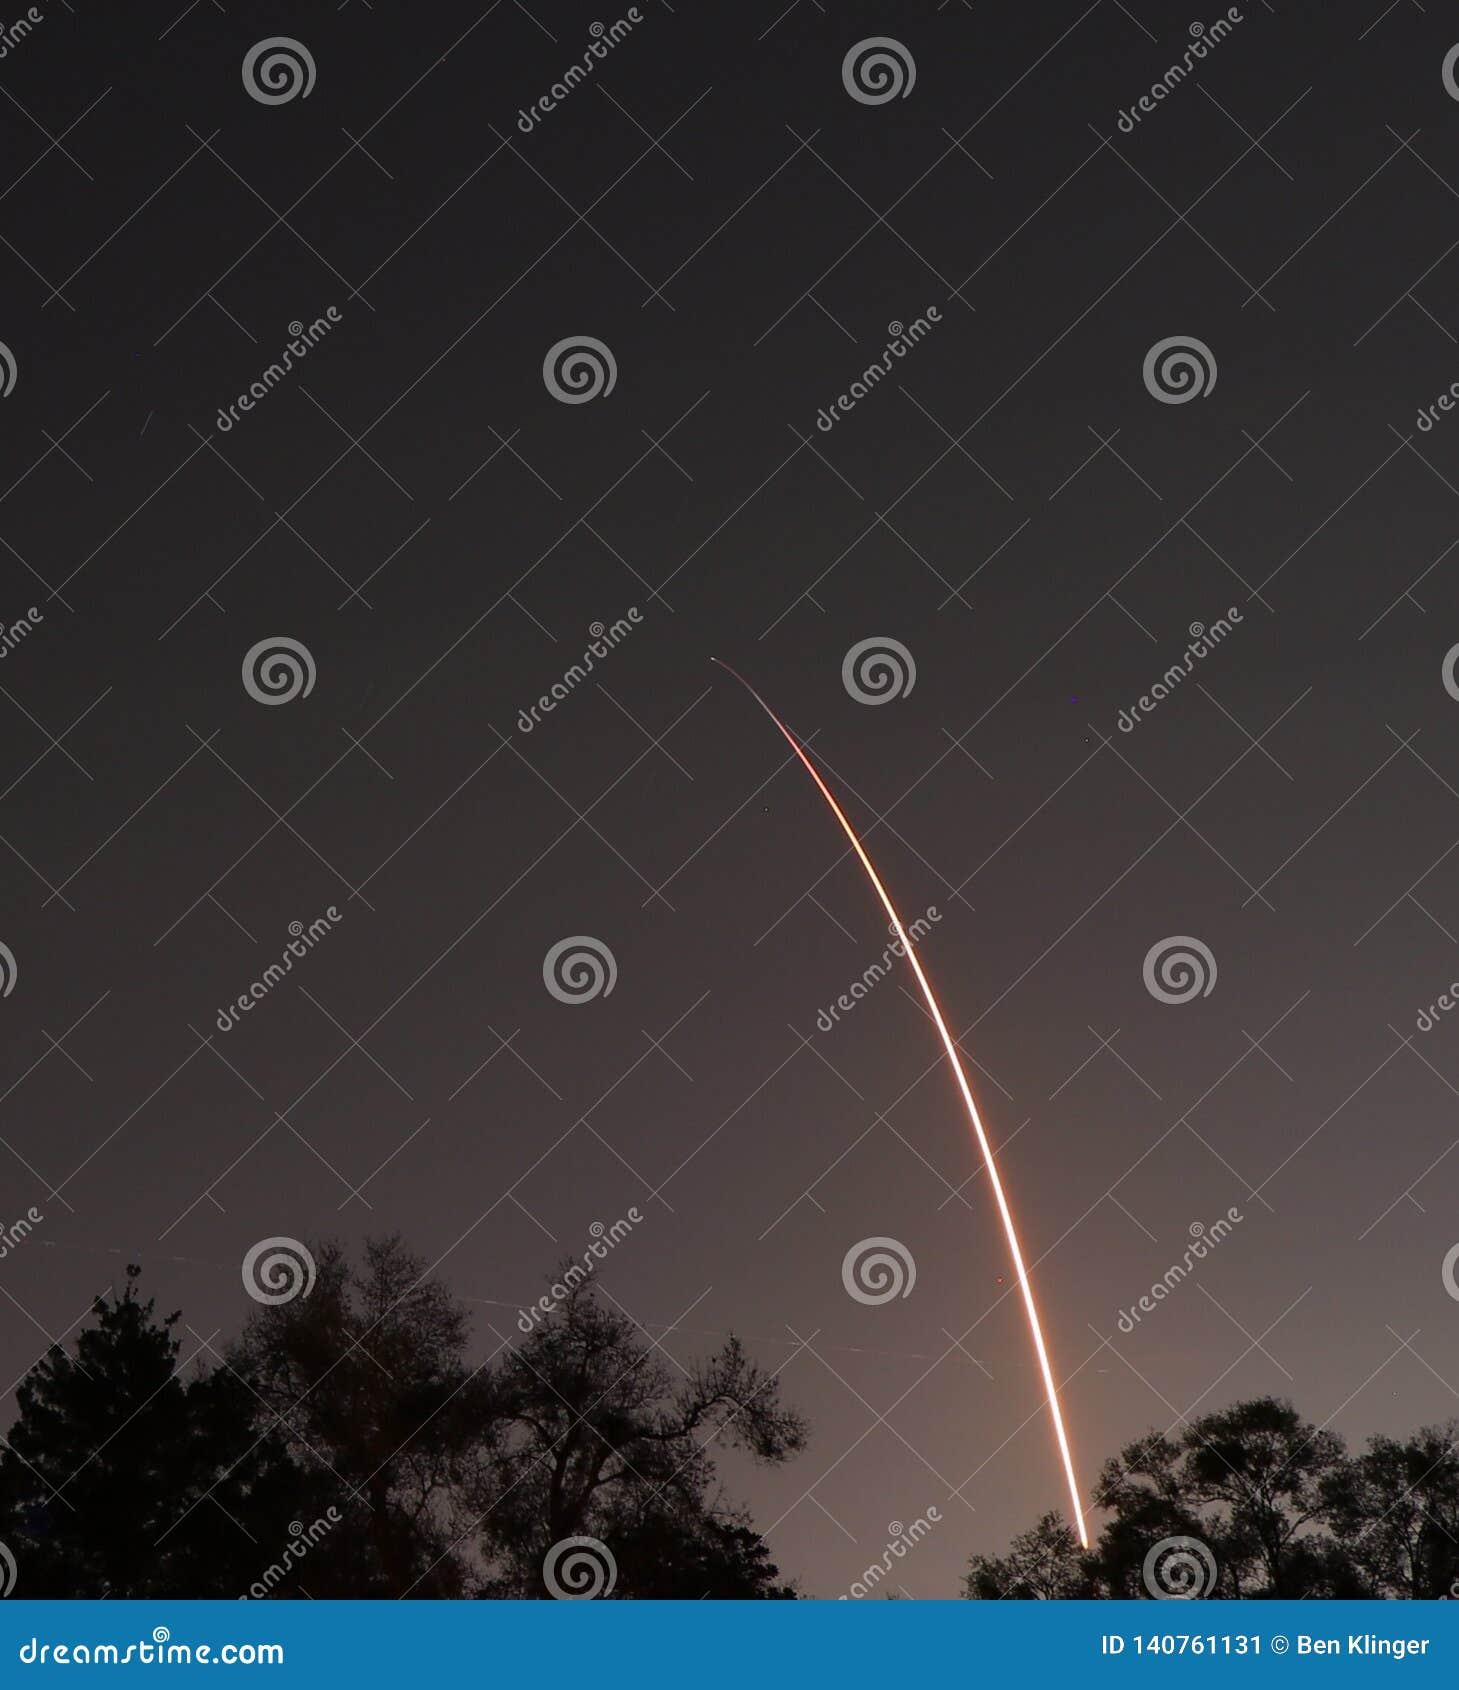 Сокол SpaceX старт 9 ночей